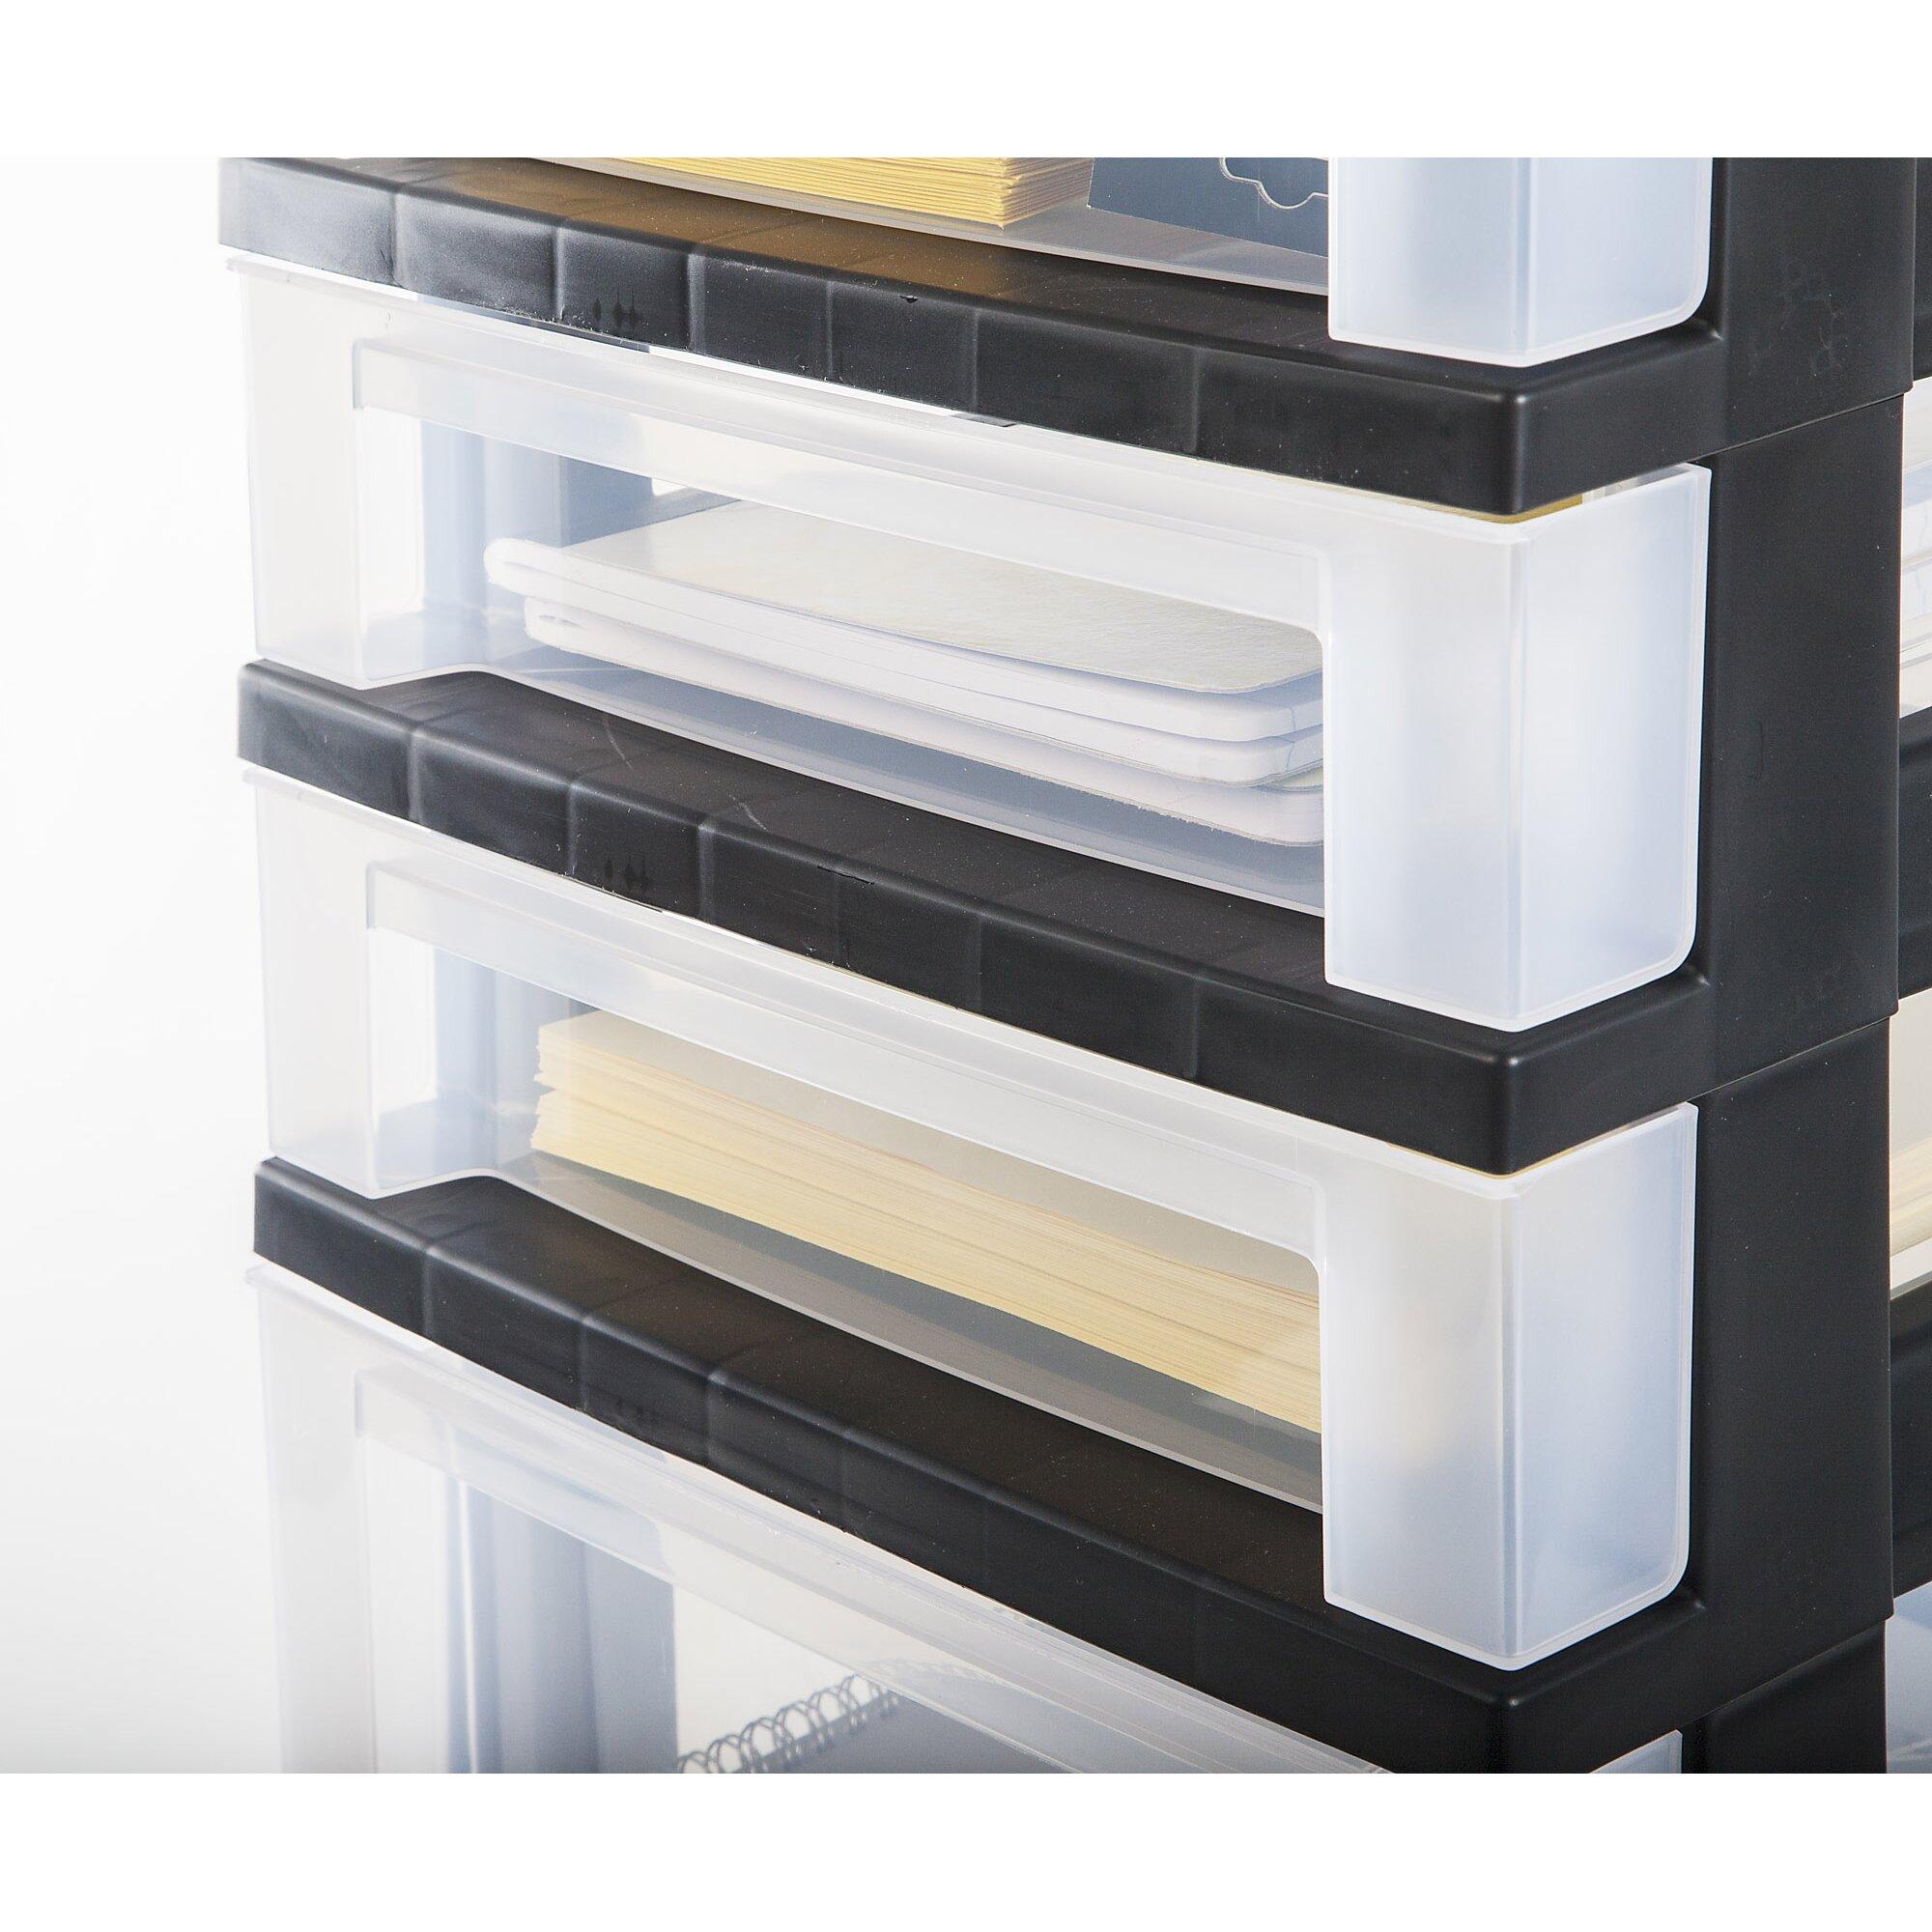 wayfair basics wayfair basics 7 drawer storage chest. Black Bedroom Furniture Sets. Home Design Ideas